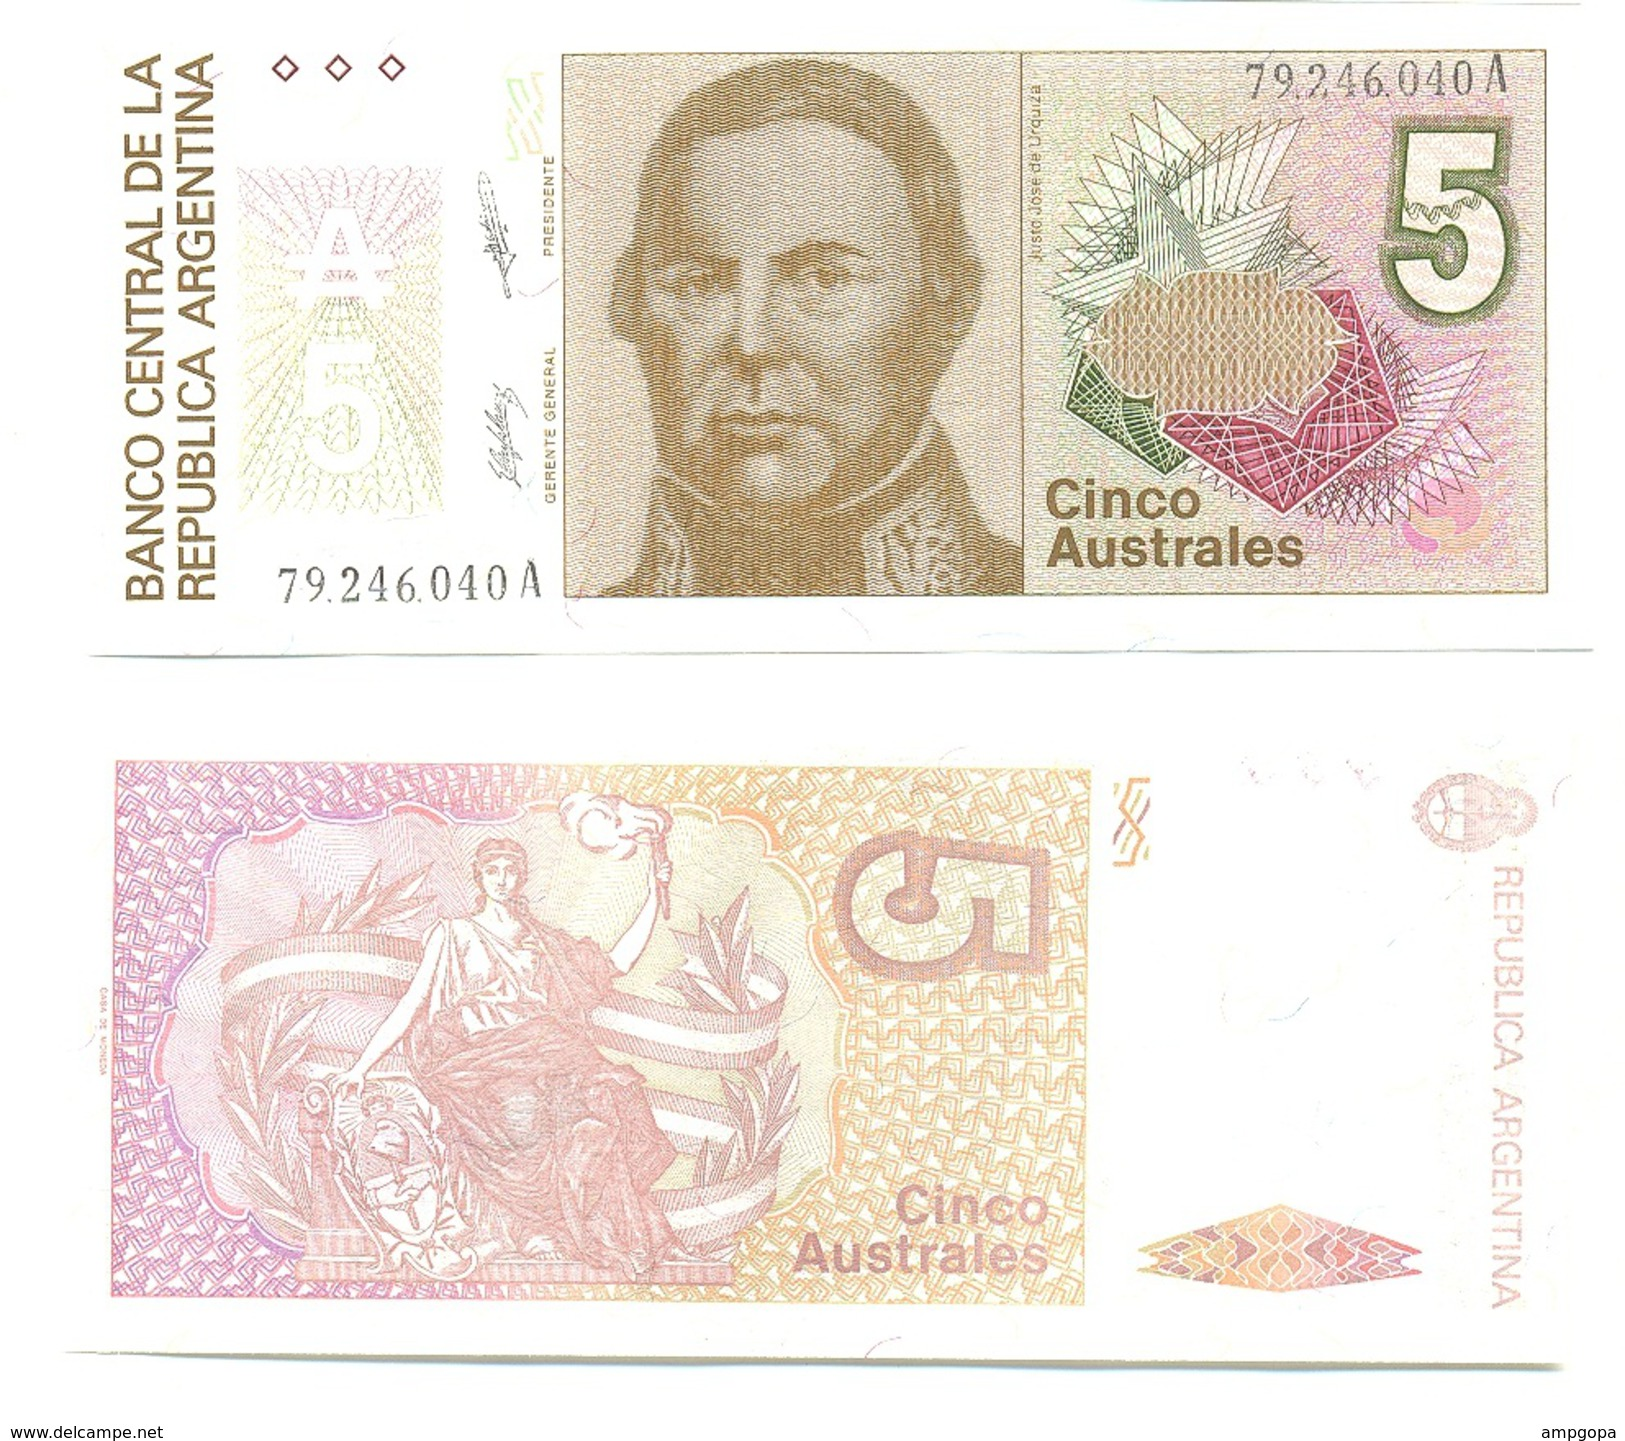 Argentina 5 Australes 1985-89 Pick 324.b UNC - Argentina